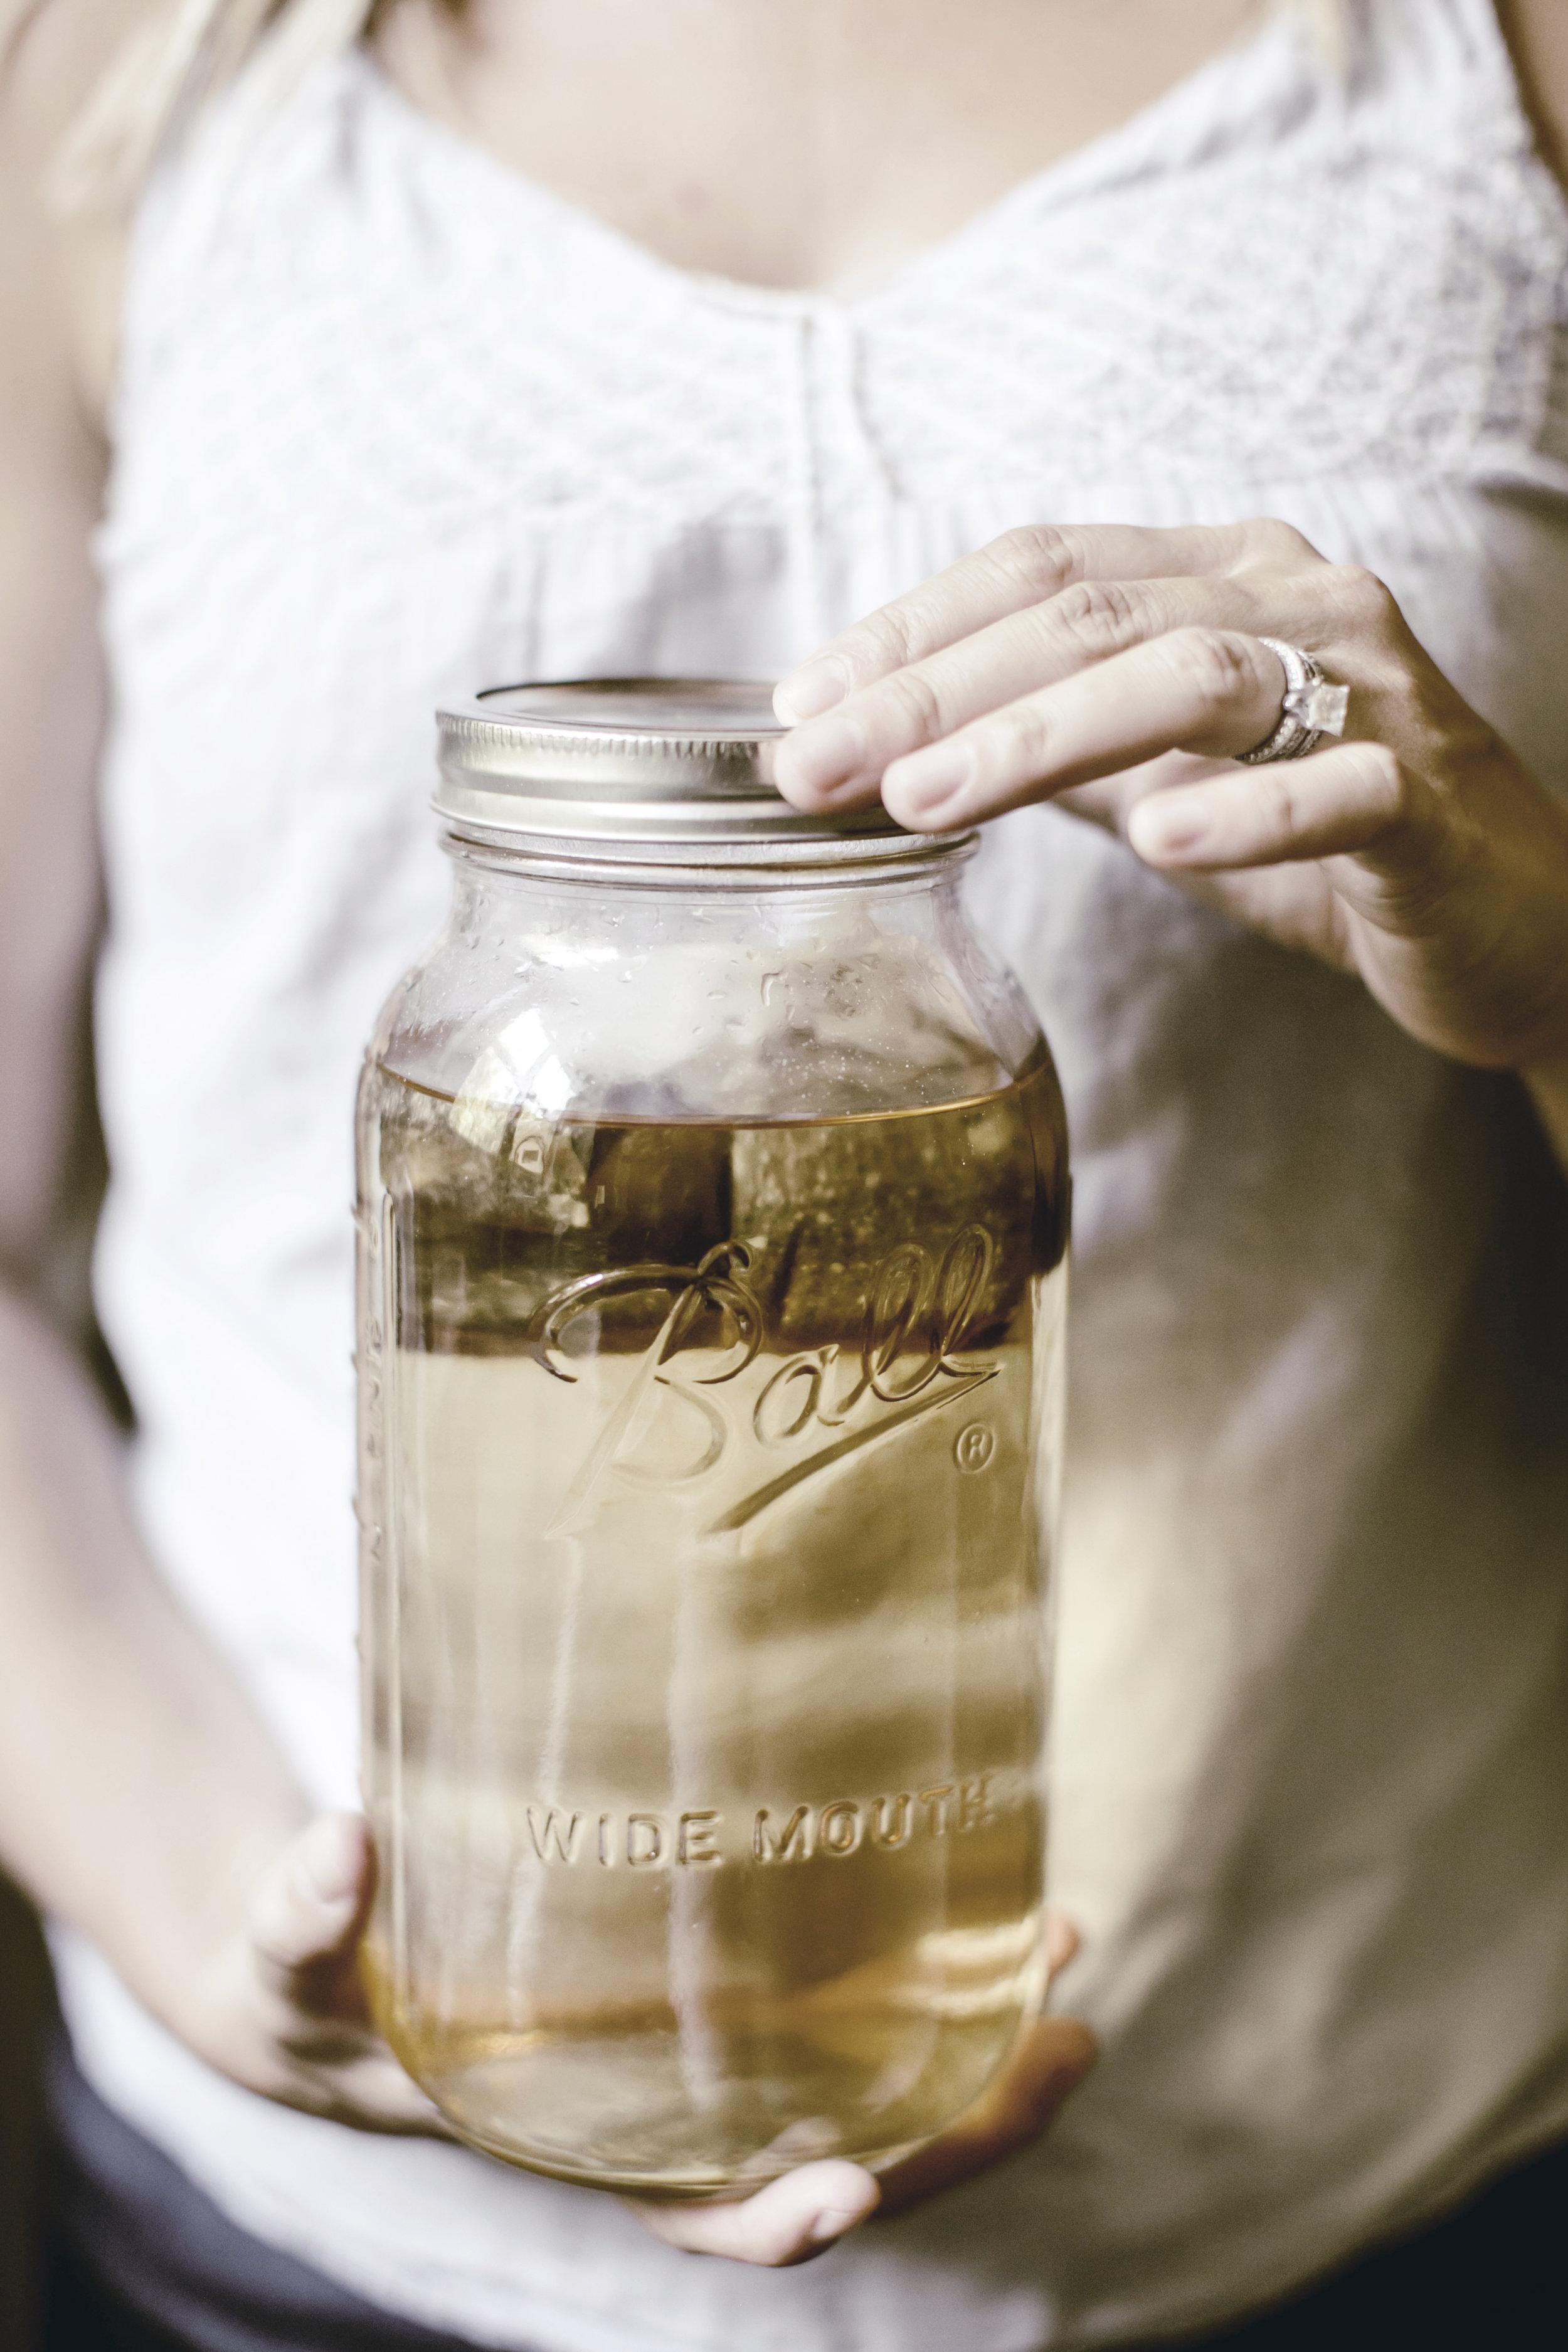 early brewing sun tea / heirloomed